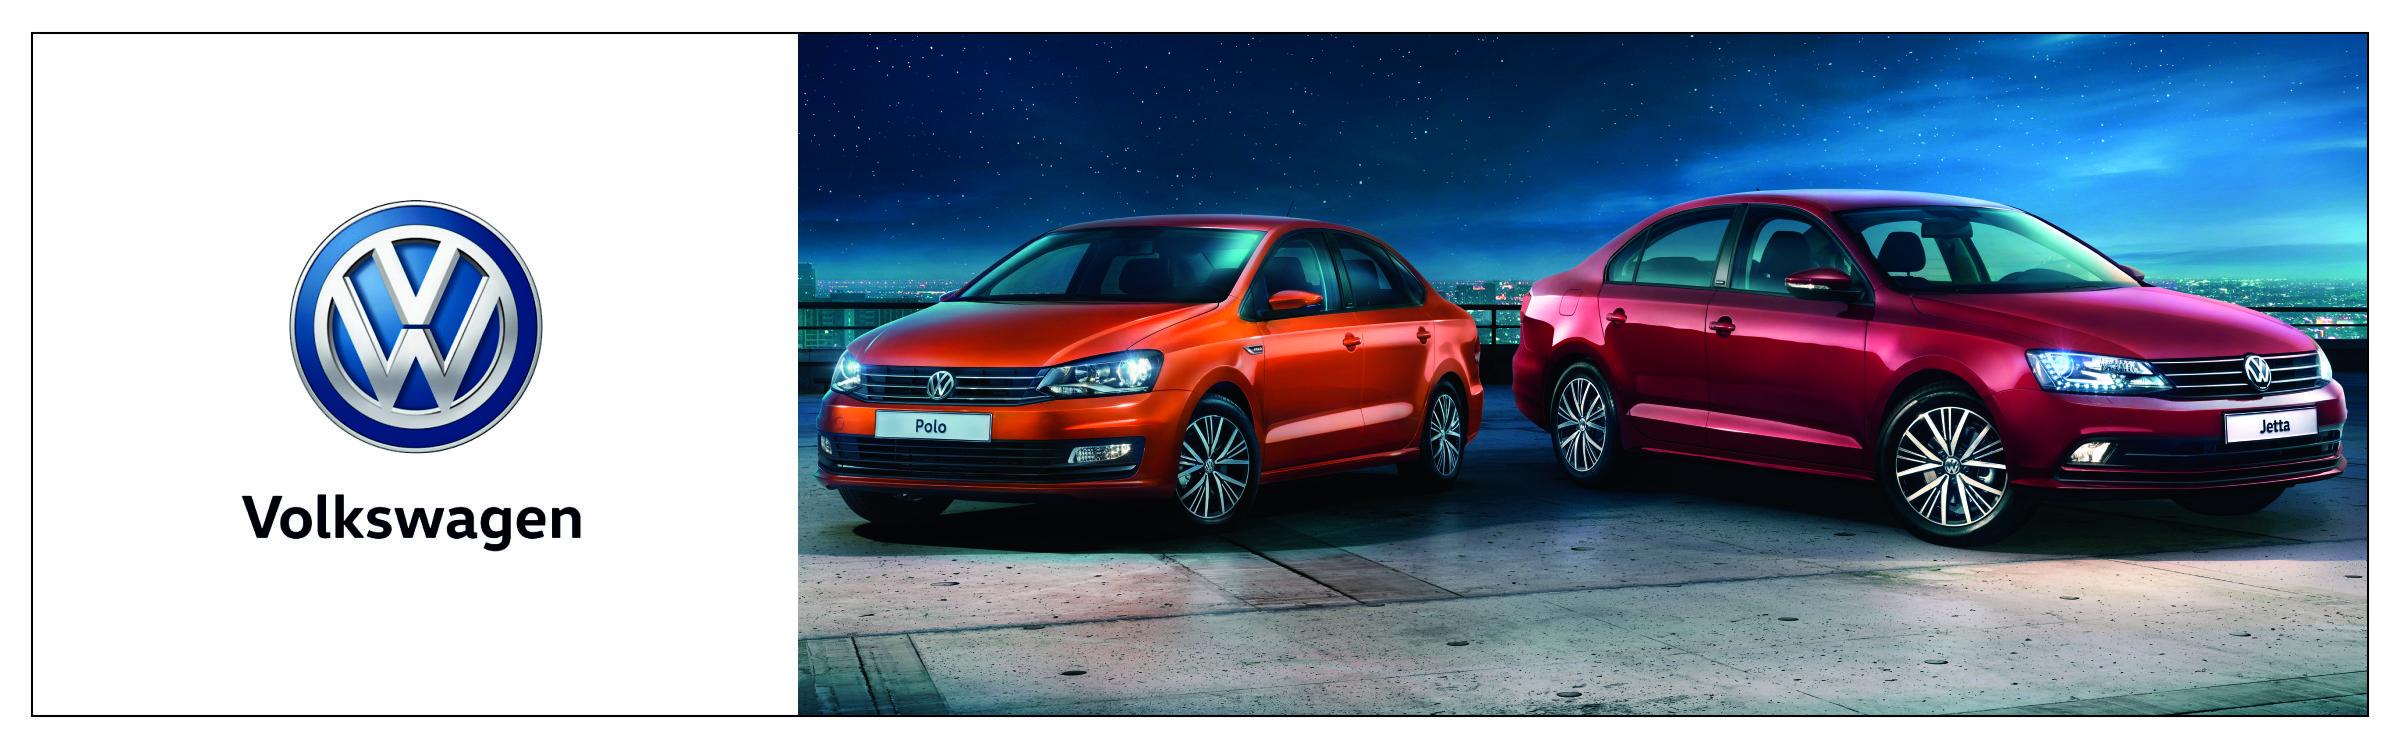 Дилер и сервис Volkswagen 'Гедон-Аксай - Дилер и сервис Volkswagen' в Ростове-на-Дону. Главная страница